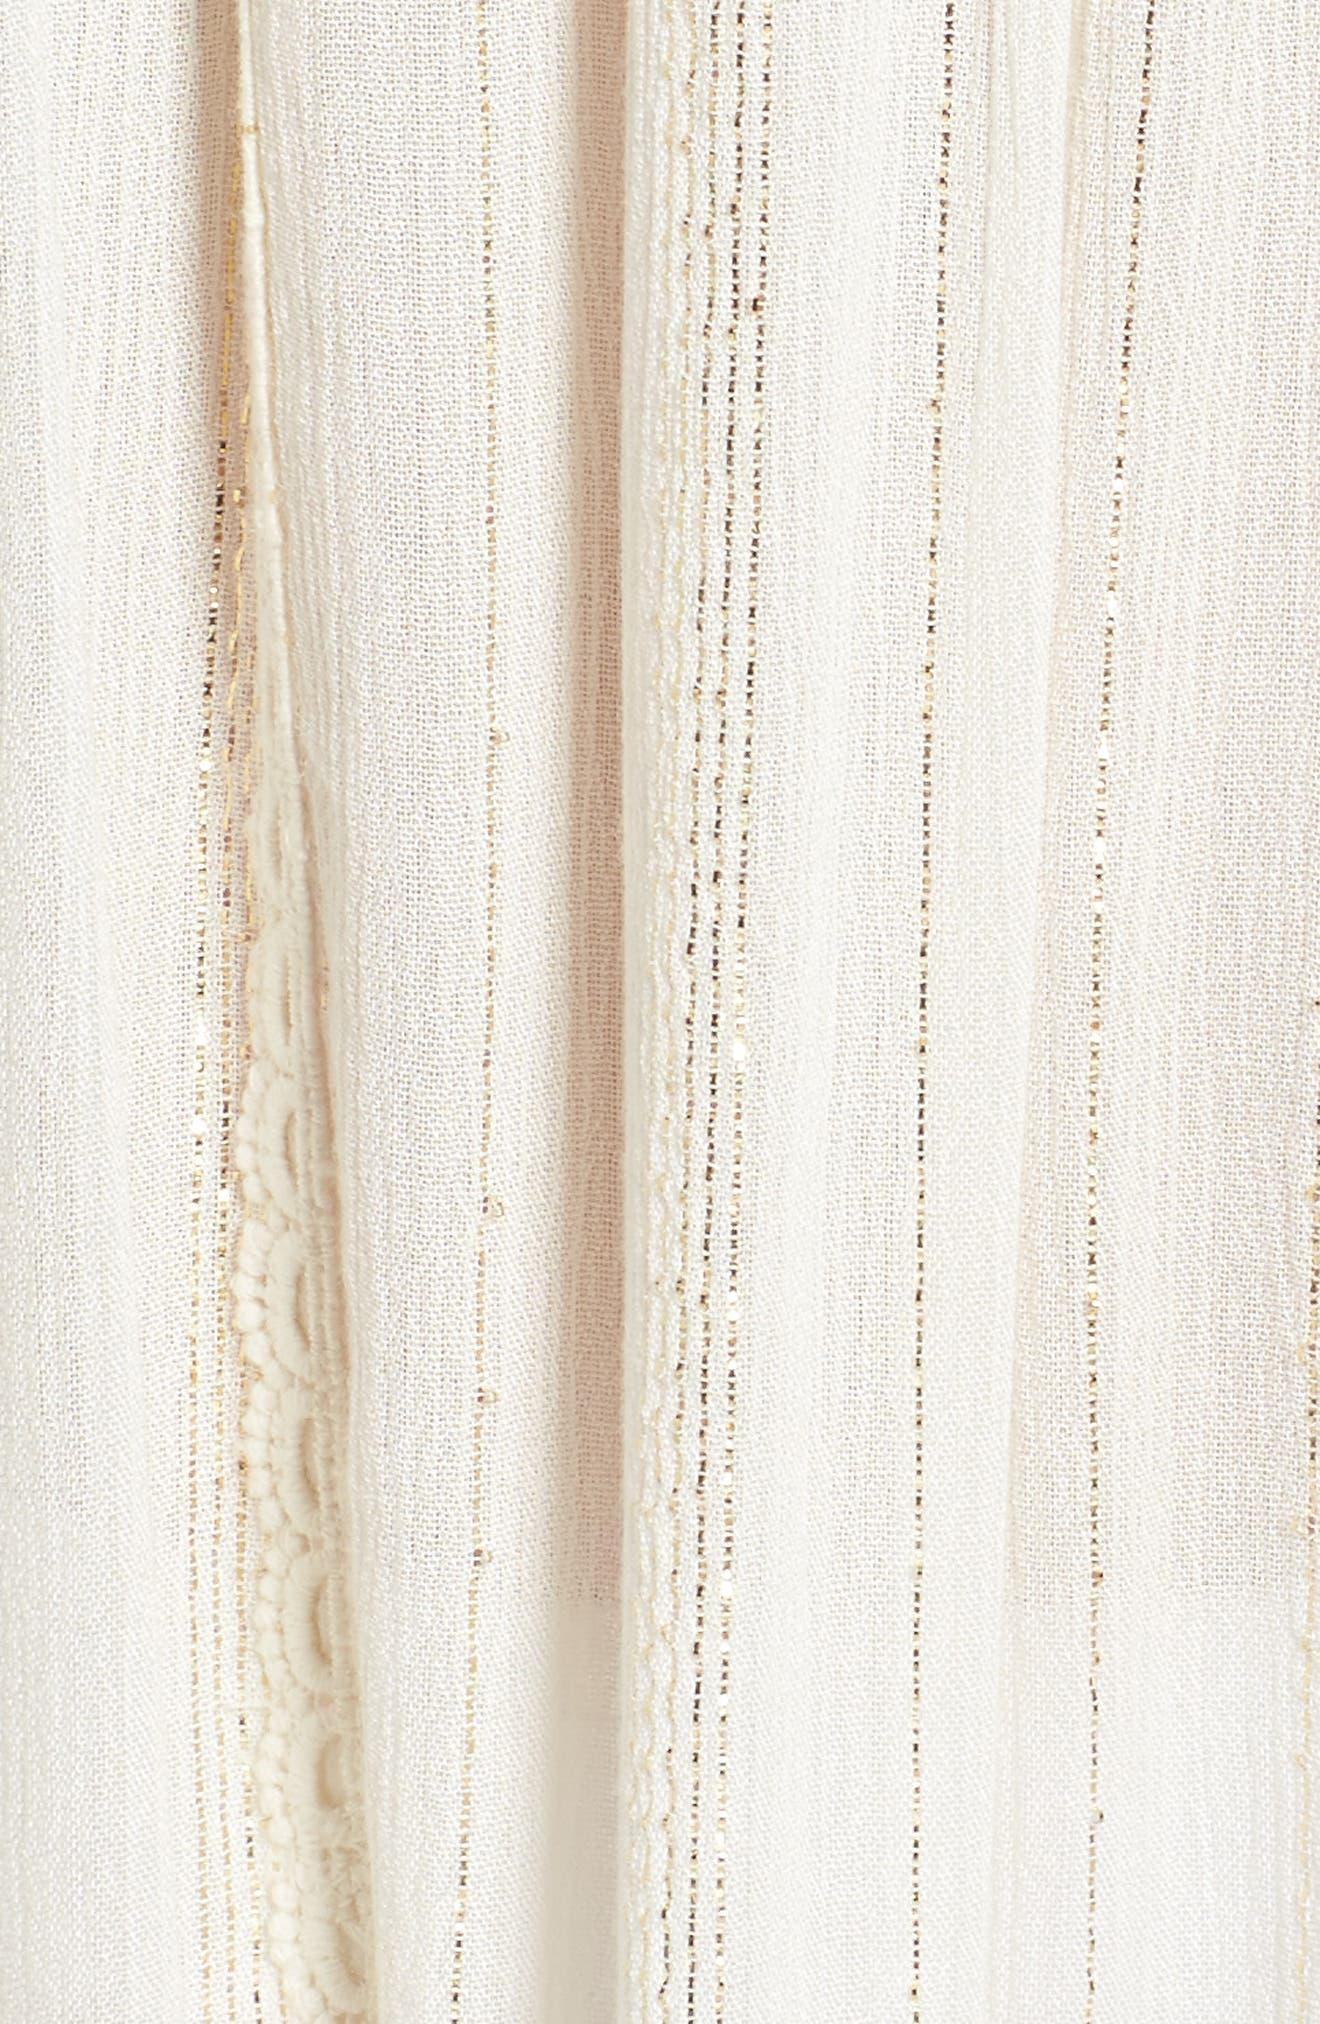 Iris Ruffle Cover-Up Dress,                             Alternate thumbnail 5, color,                             100